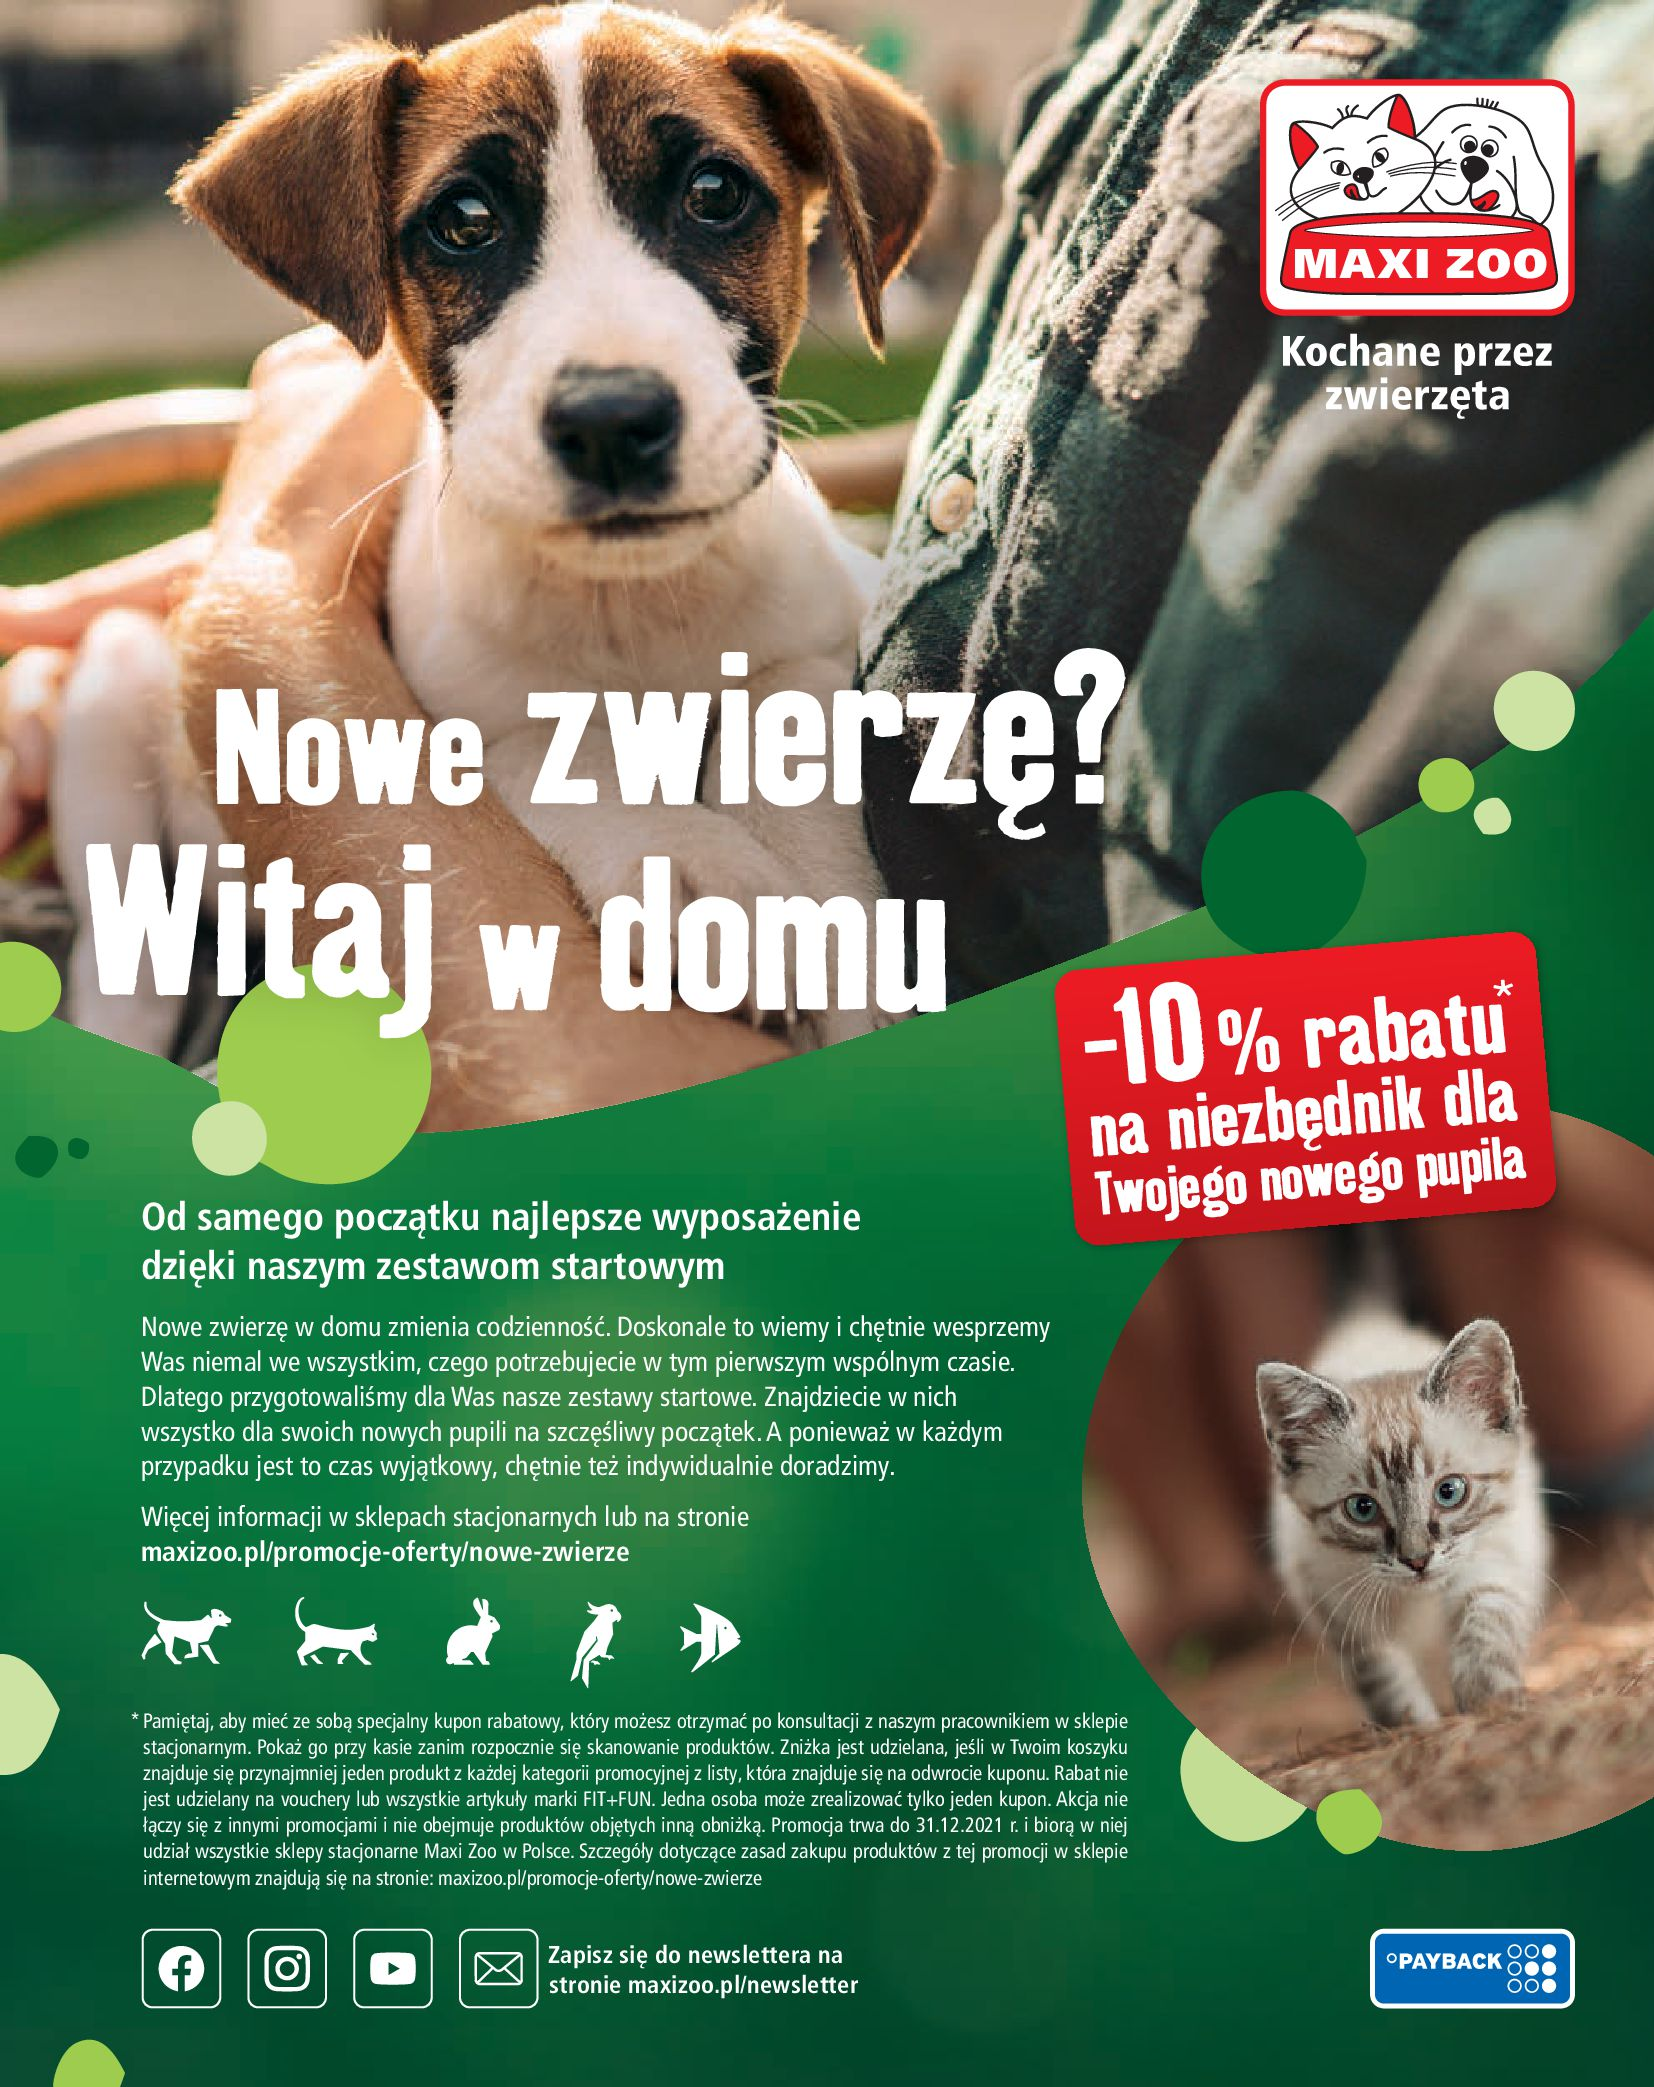 Gazetka Maxi Zoo: Gazetka Maxi Zoo 2021-08-09 page-56